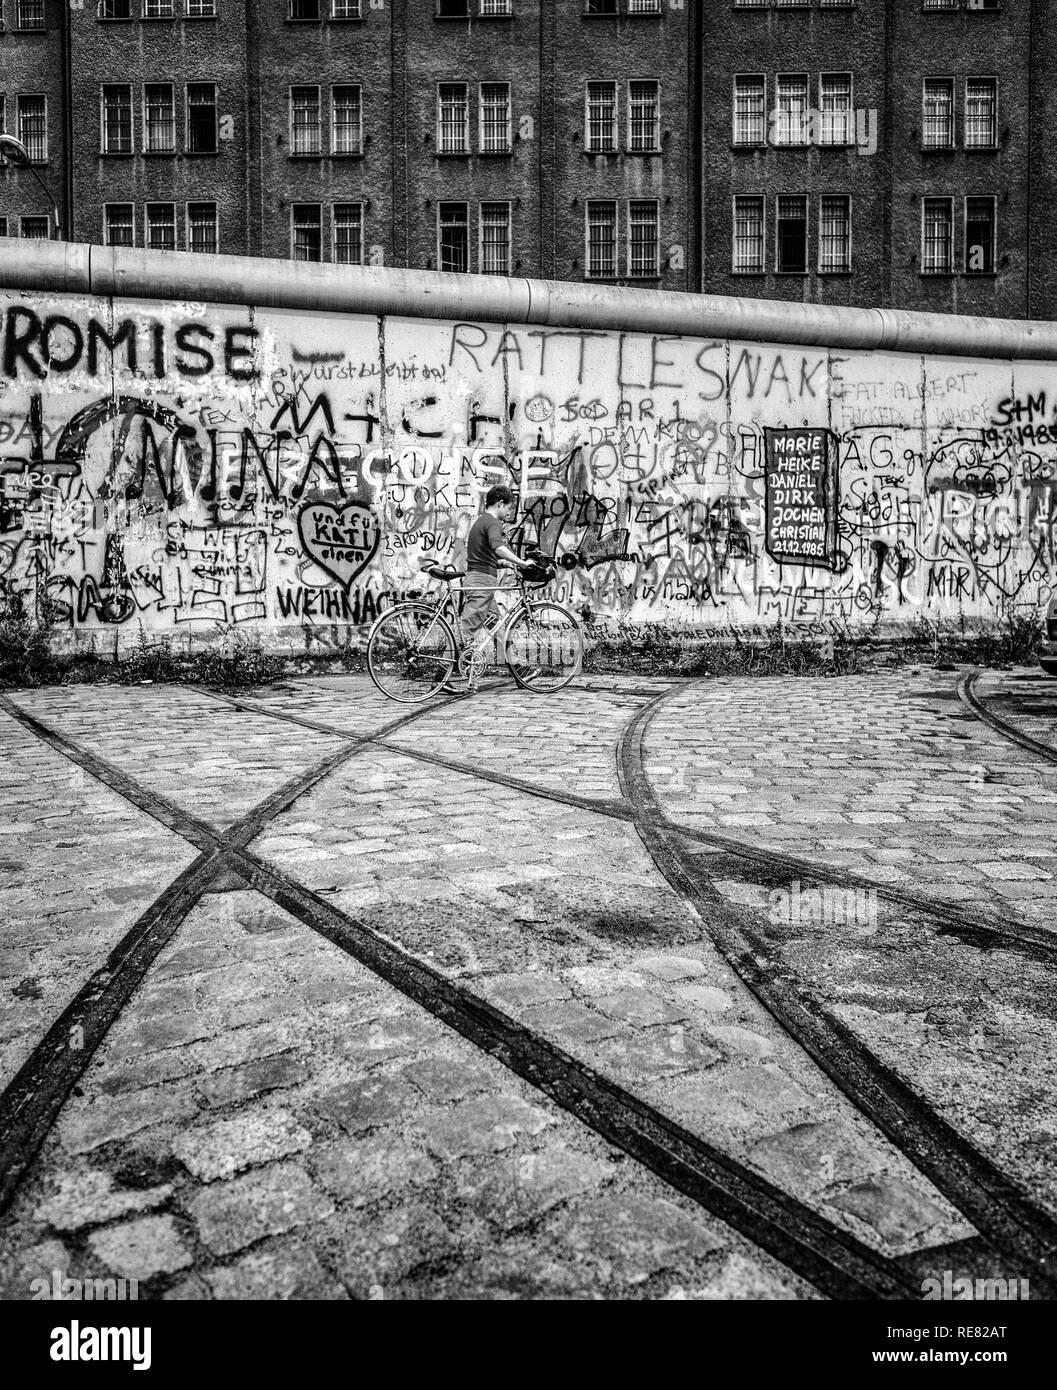 August 1986, Berlin Wall graffitis, tram track ending into wall, cyclist, East Berlin building, West Berlin side, Germany, Europe, - Stock Image